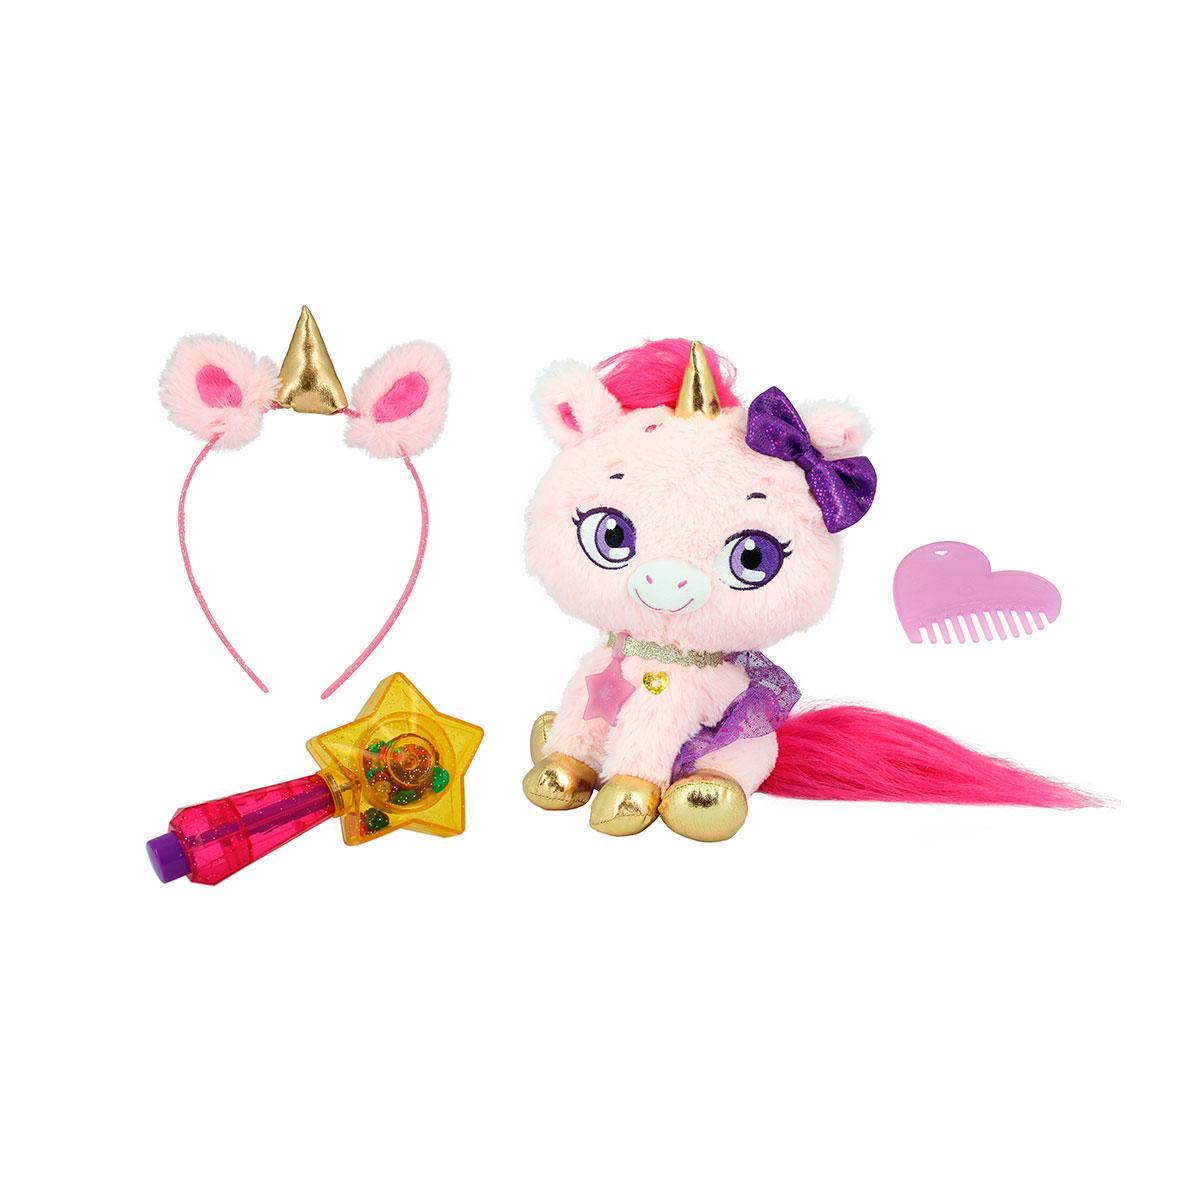 Мягкая игрушка Shimmer stars Единорог Твинки с аксессуарами 28 см